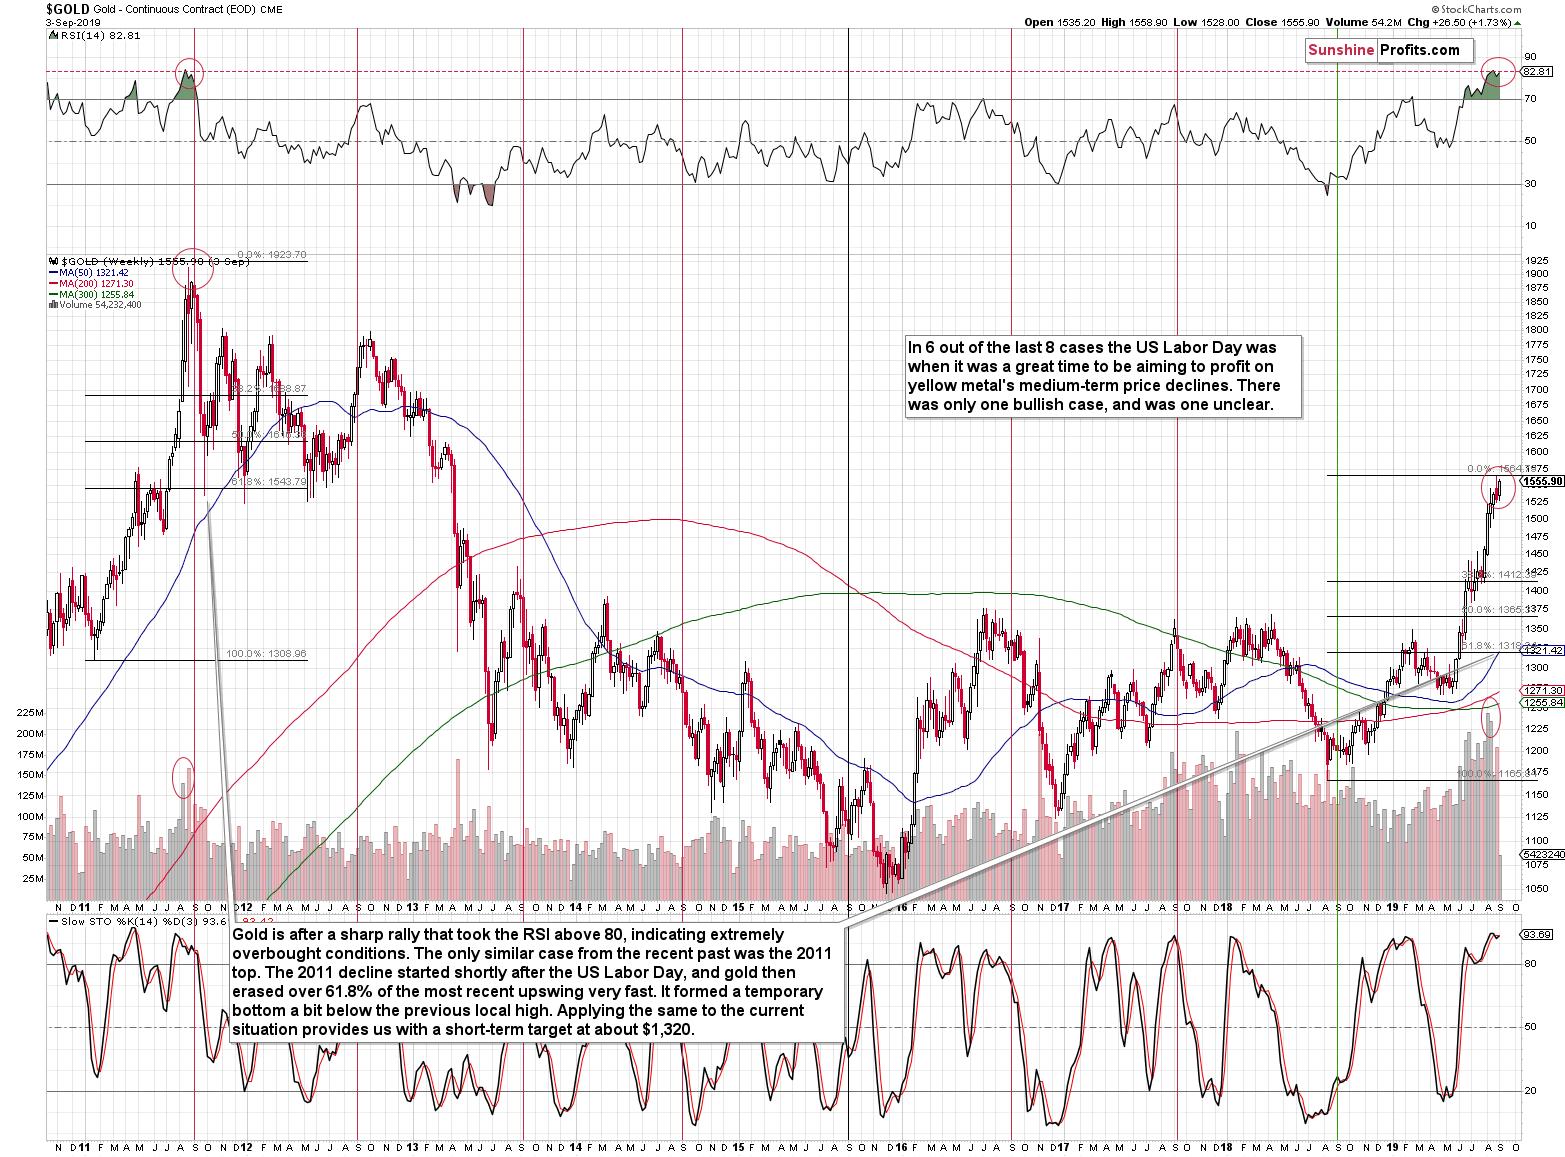 Gold Price Forecast: Gold Price Around Labor Day (Part 2